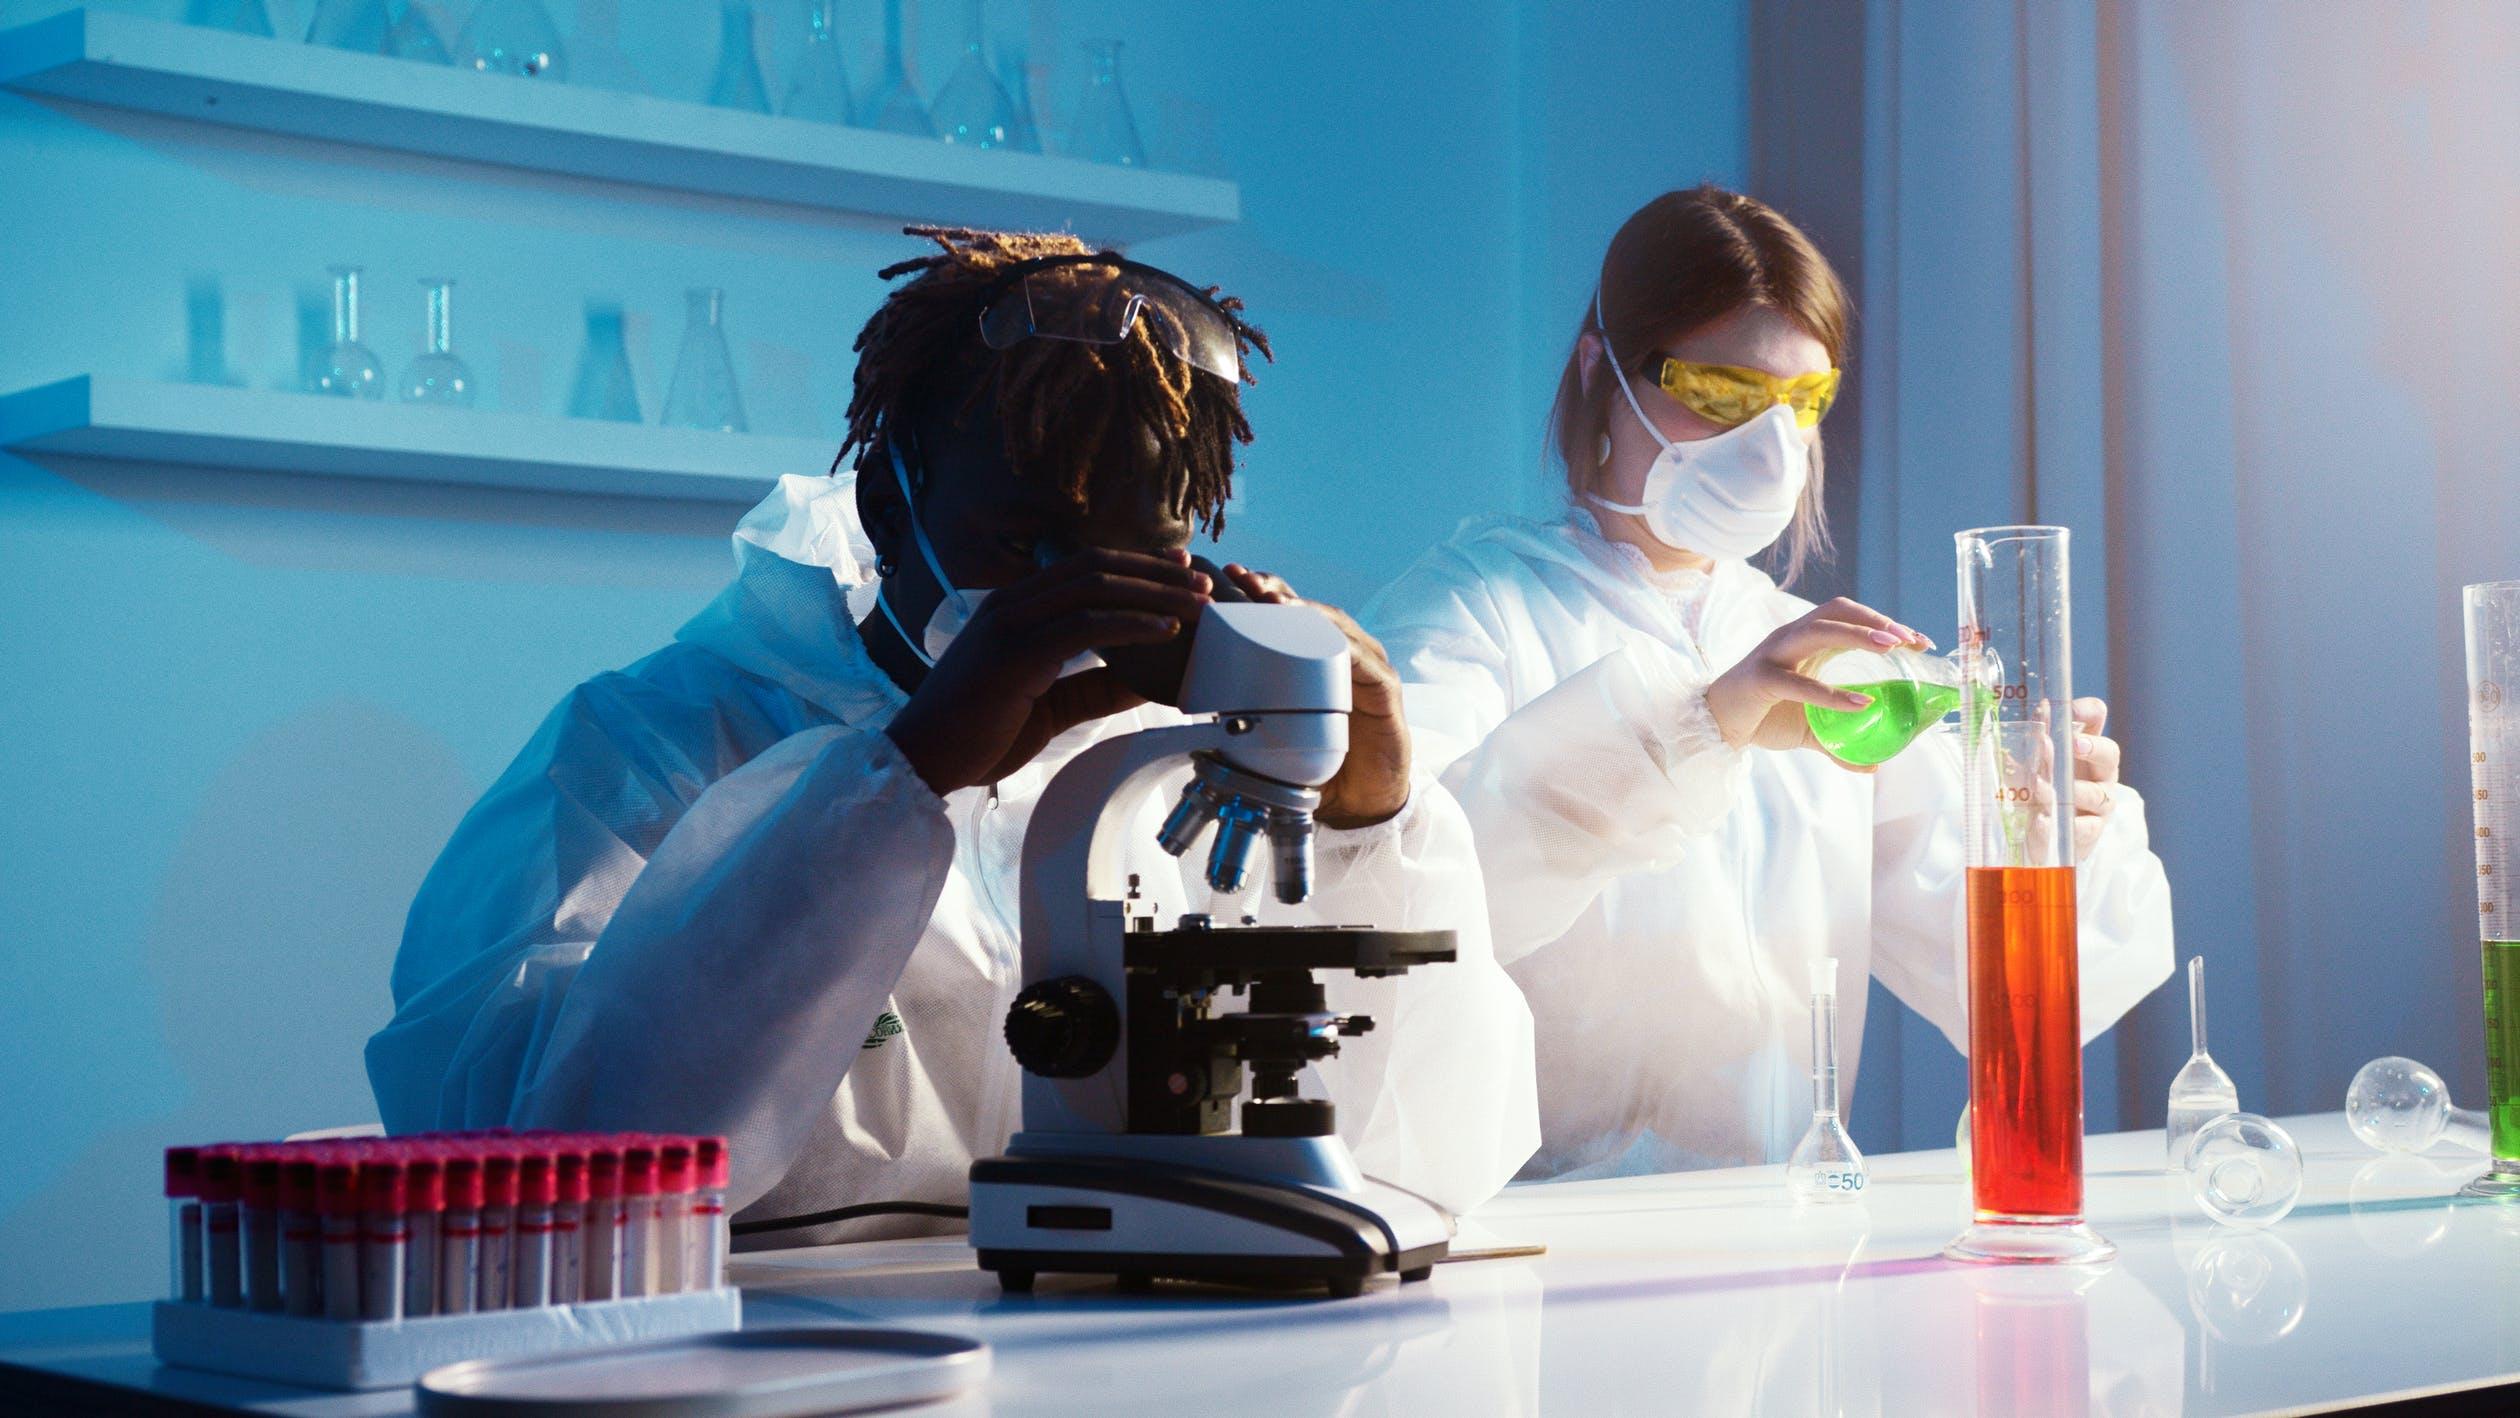 De verschillen tussen Atomic Force Microscopy en Scanning Electron Microscopy